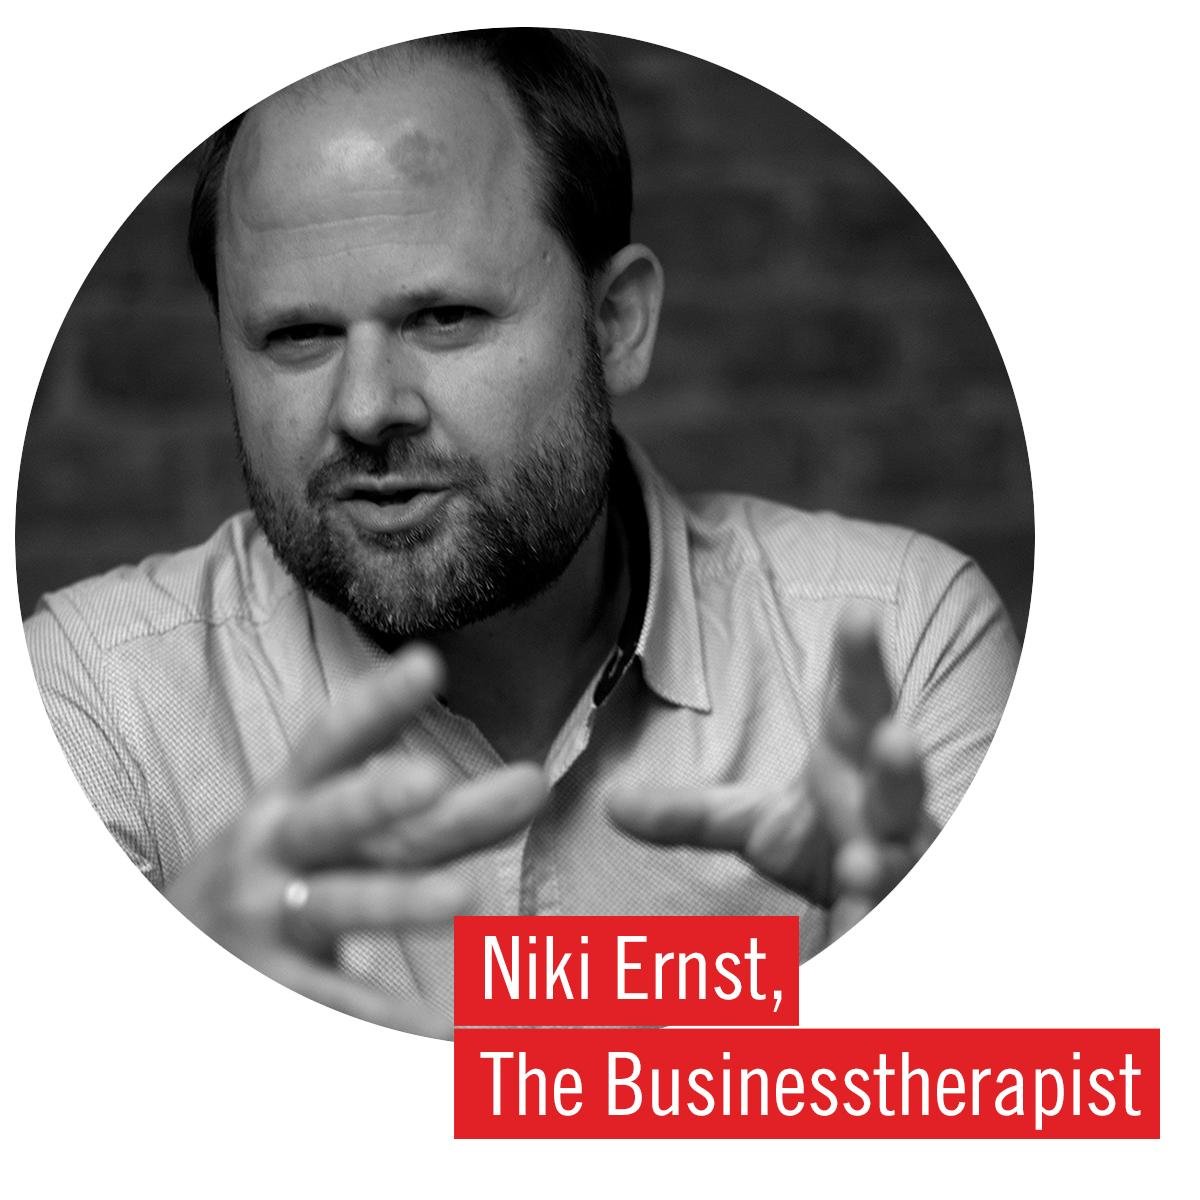 Niki Ernst